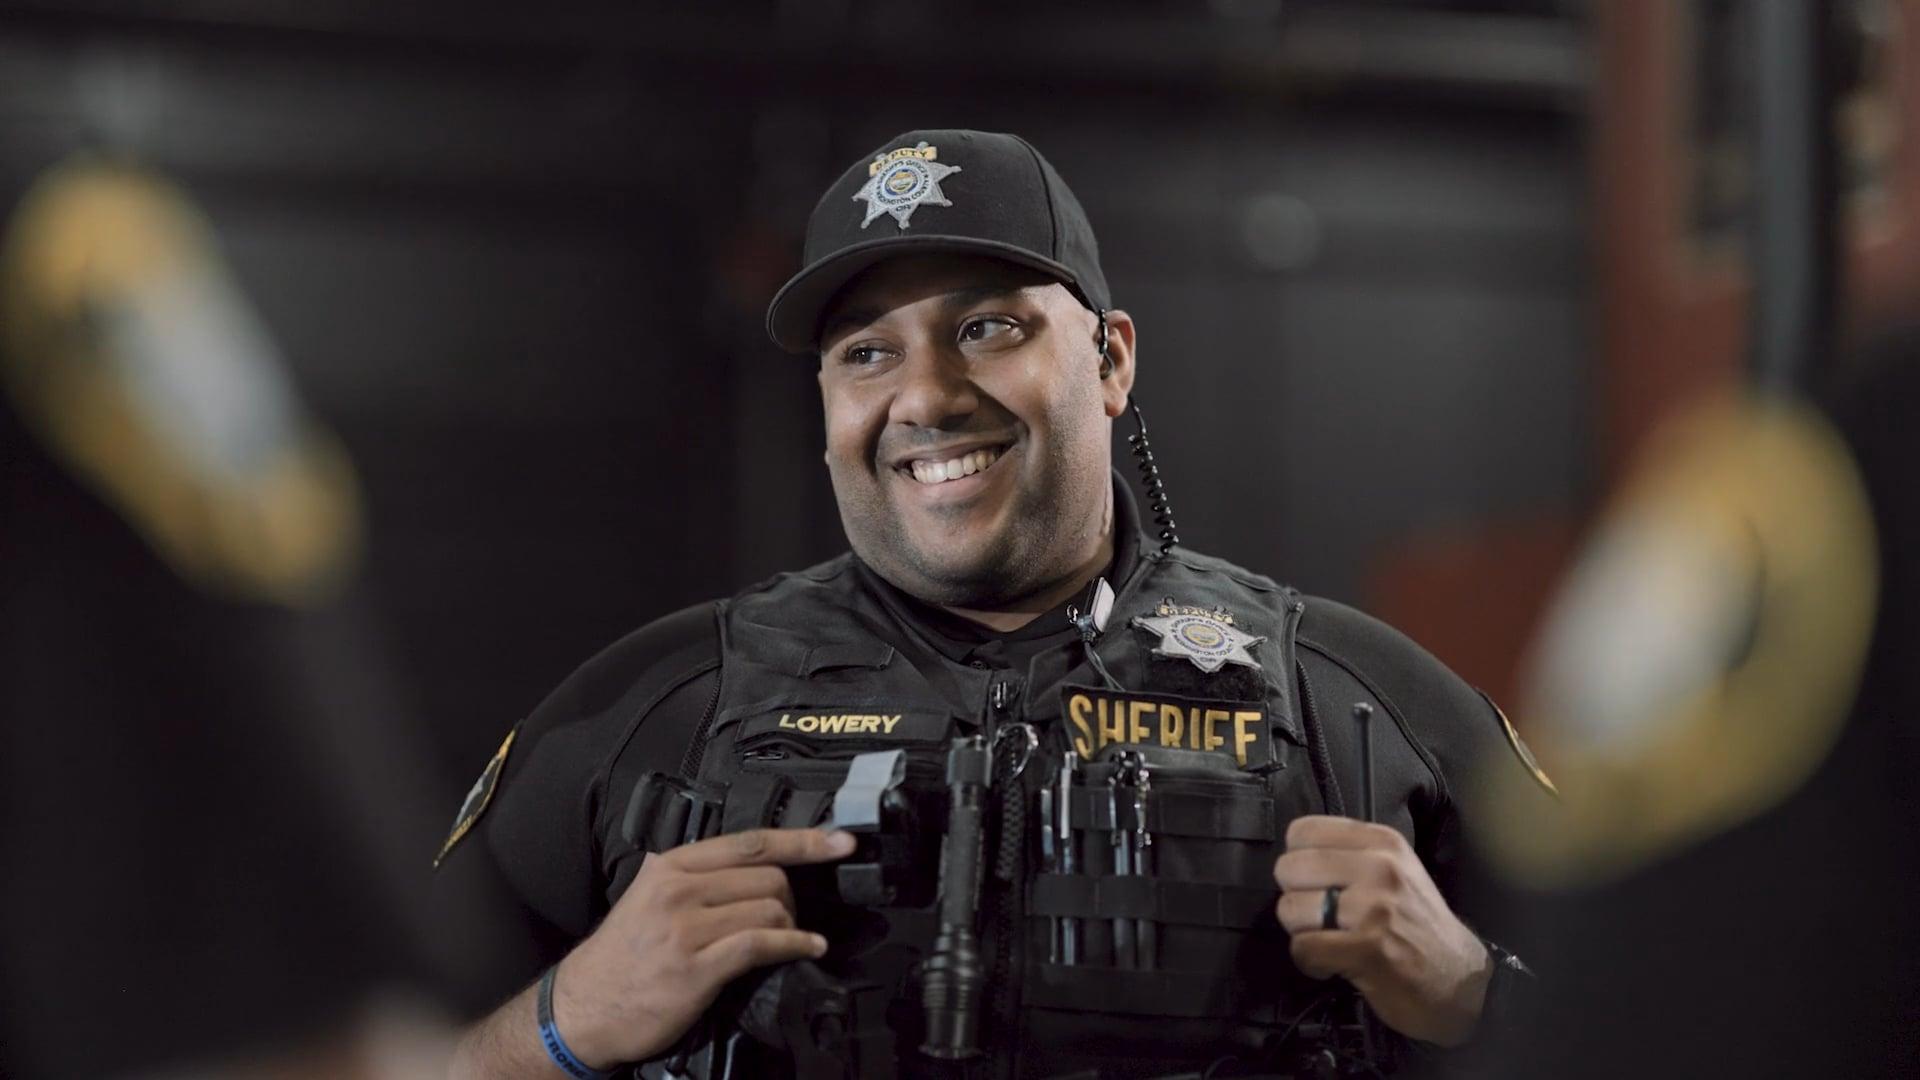 WASHINGTON COUNTY SHERIFF'S OFFICE -  TRAINING CENTER